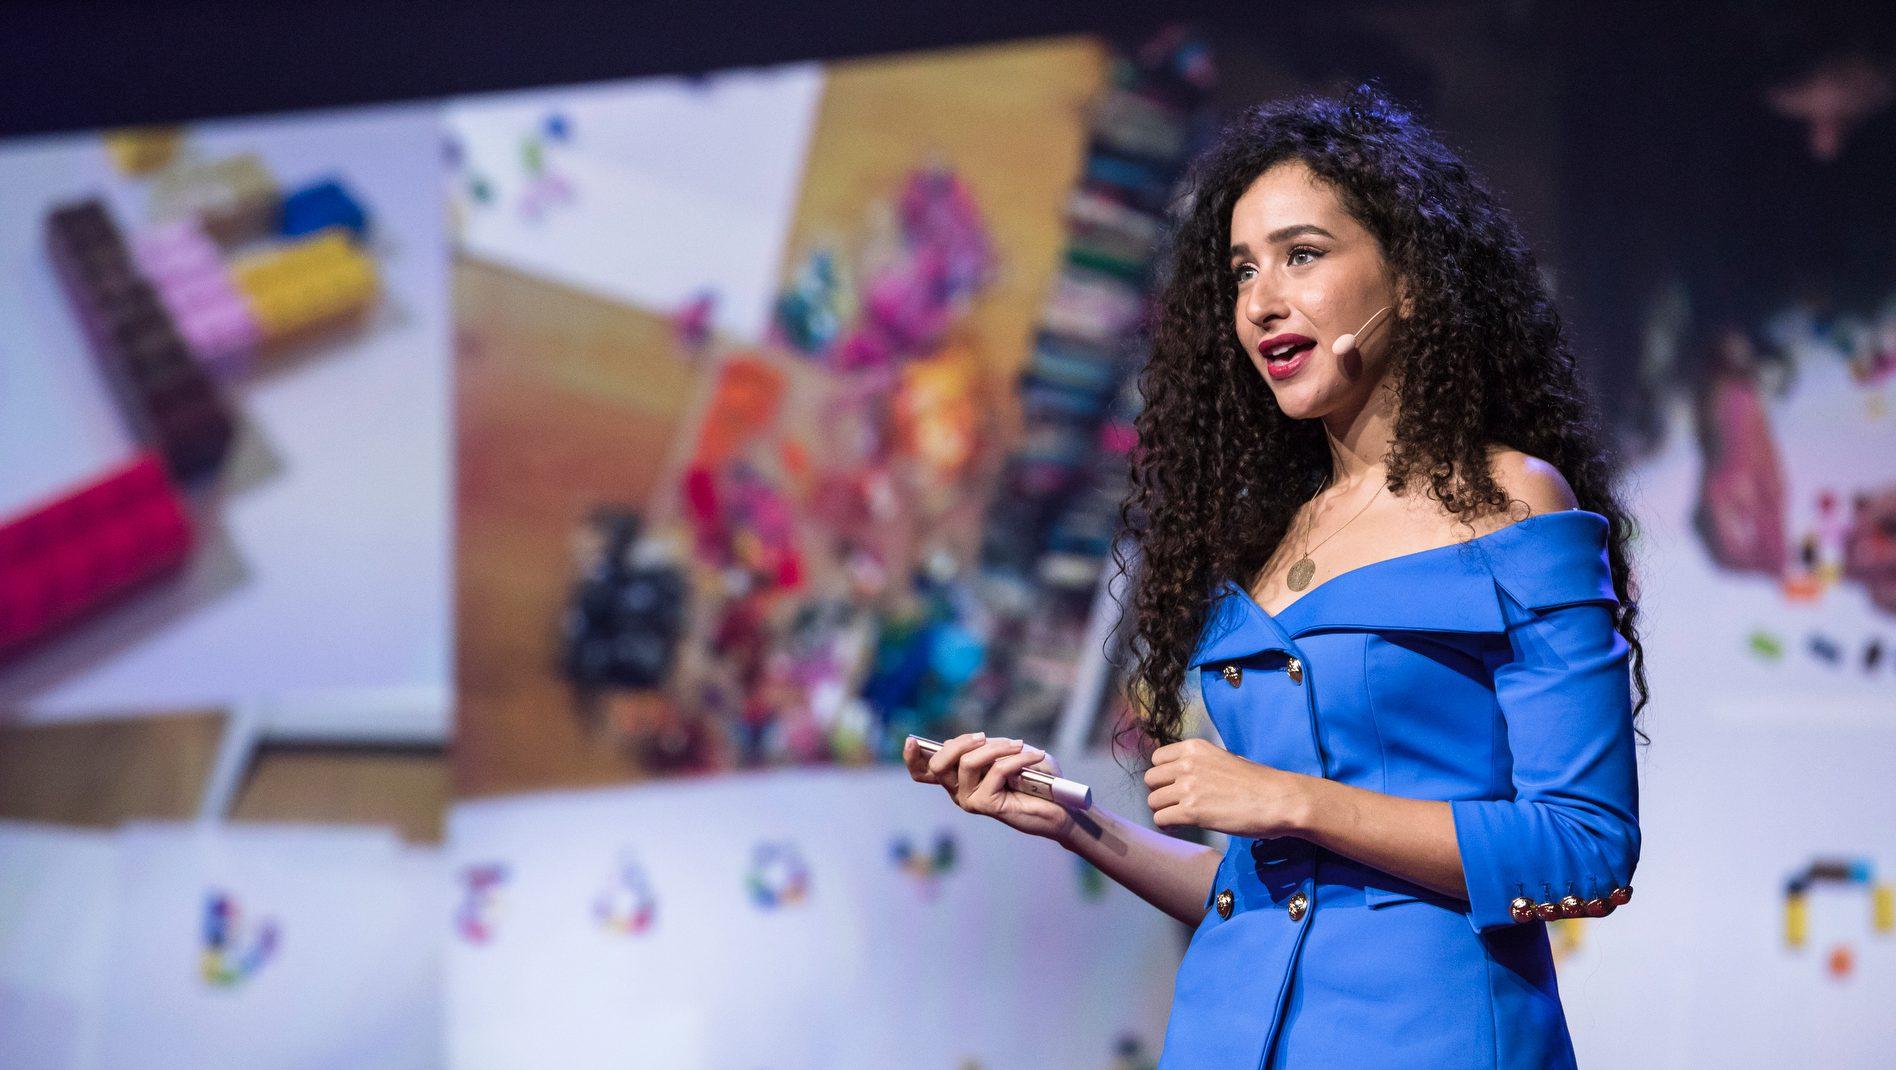 Ghada Wali speaks at TEDGlobal 2017 - Builders, Truth Tellers, Catalysts - August 27-30, 2017, Arusha, Tanzania.